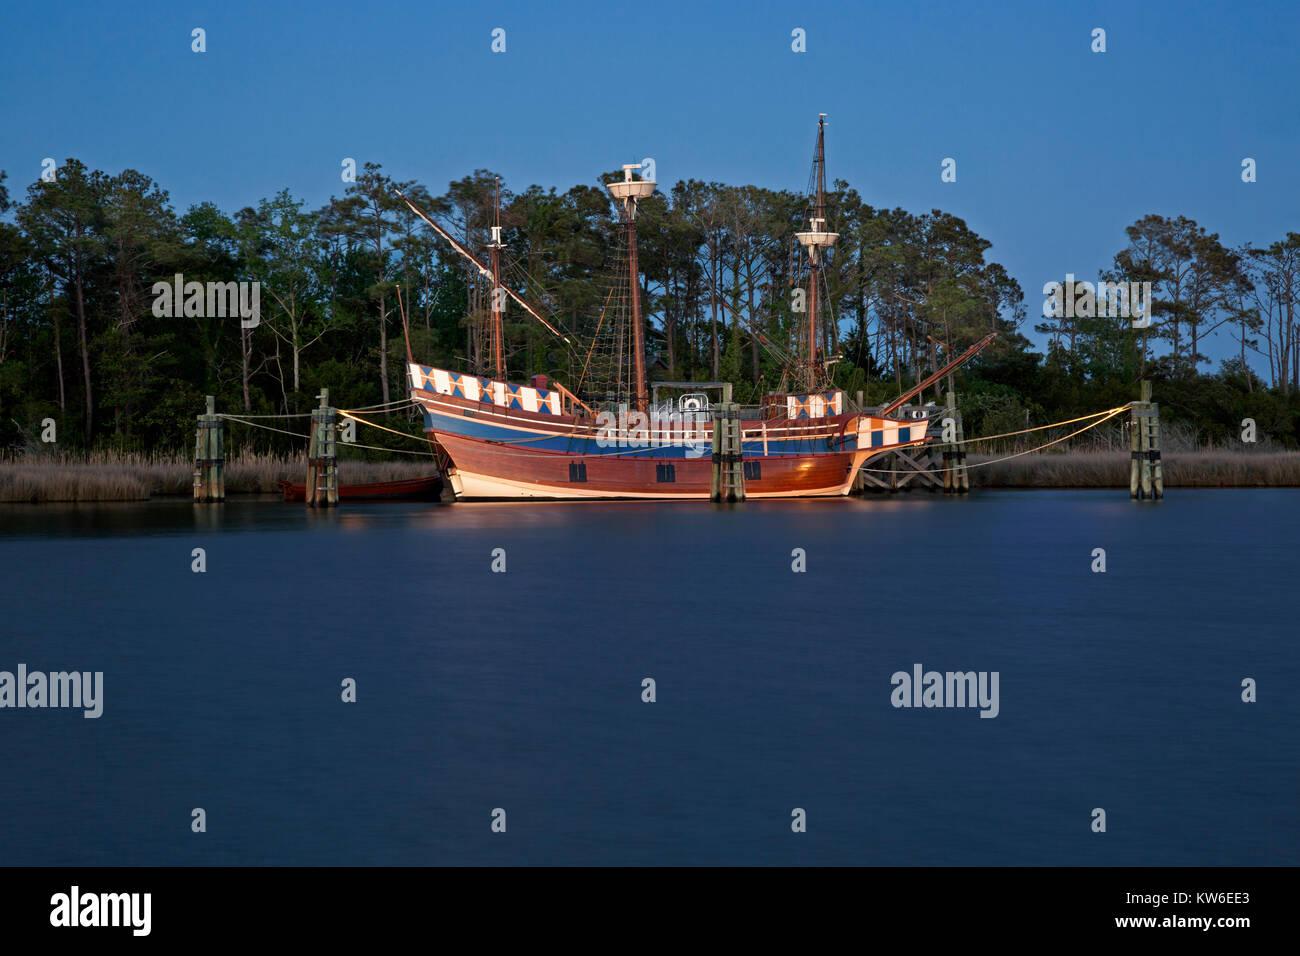 NC01210-00...NORTH CAROLINA - The 16th century replica ship, the Elizabeth ll, on display at Roanoke Festival Park Stock Photo